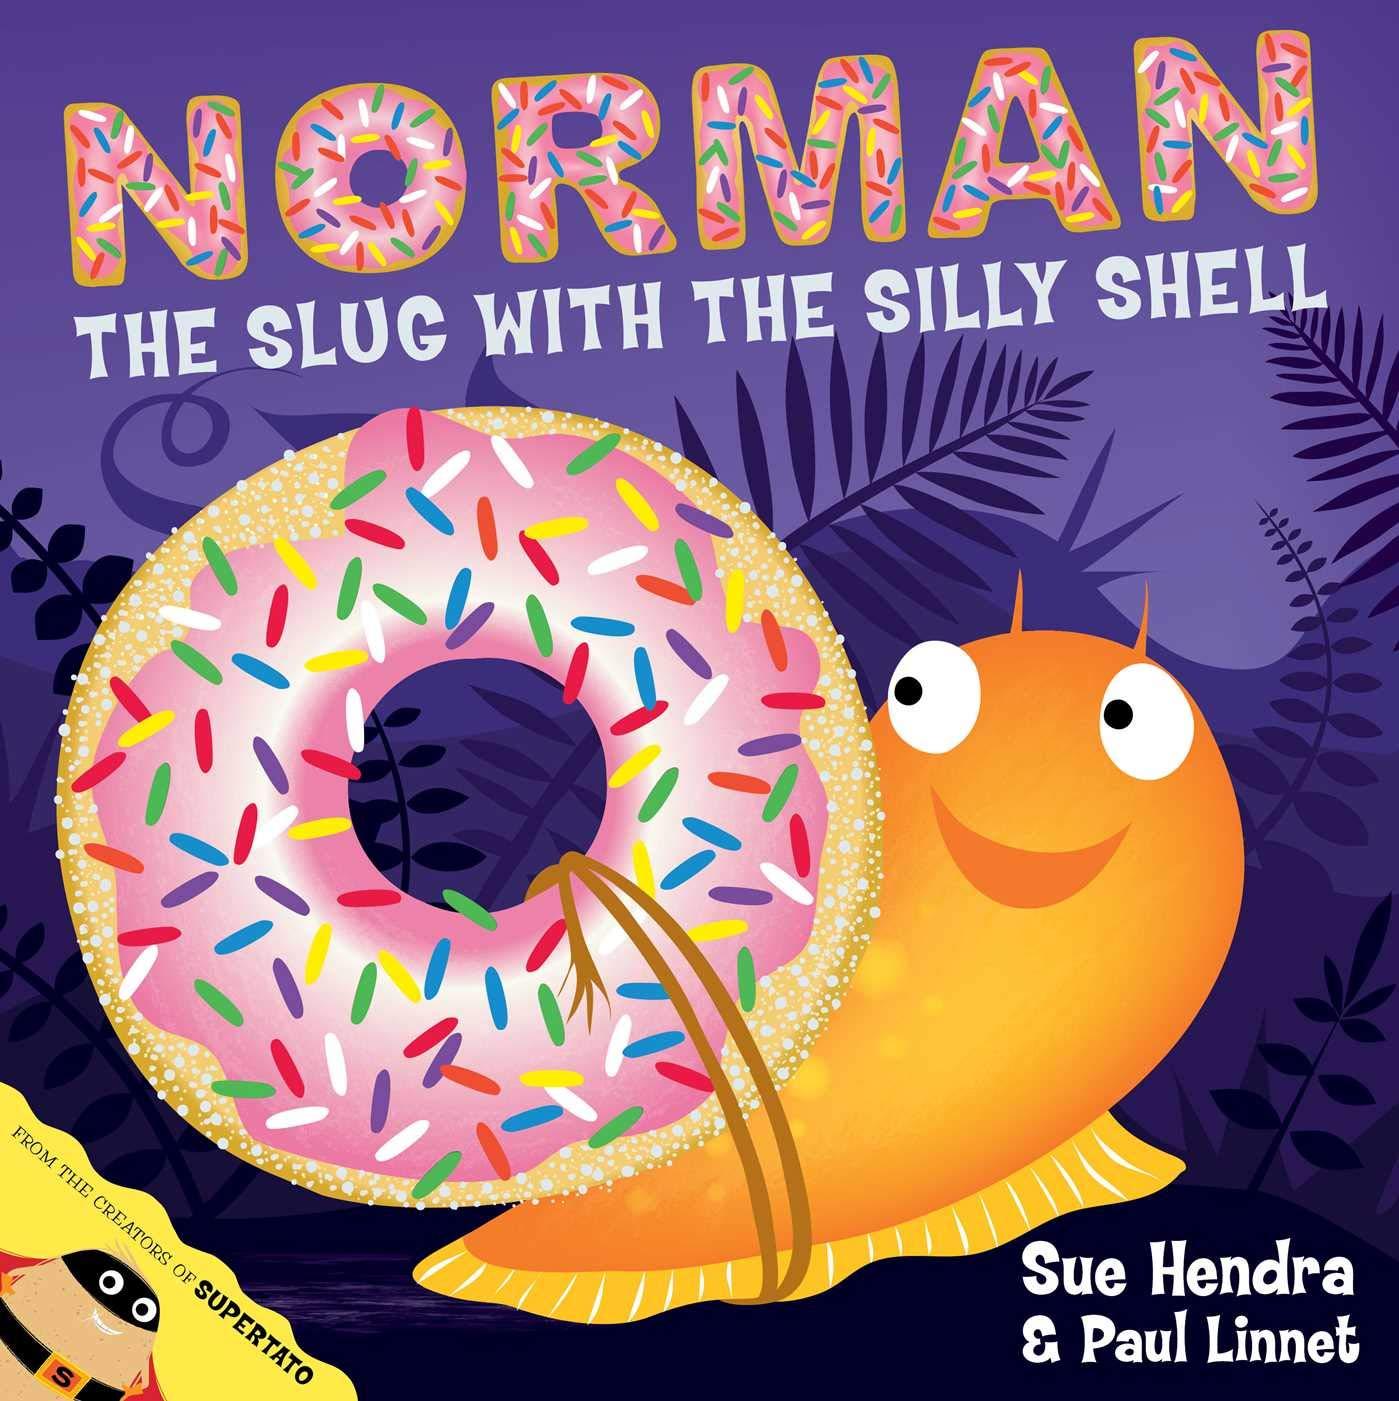 Norman the Slug with a Silly Shell: Amazon.co.uk: Hendra, Sue, Linnet,  Paul: Books